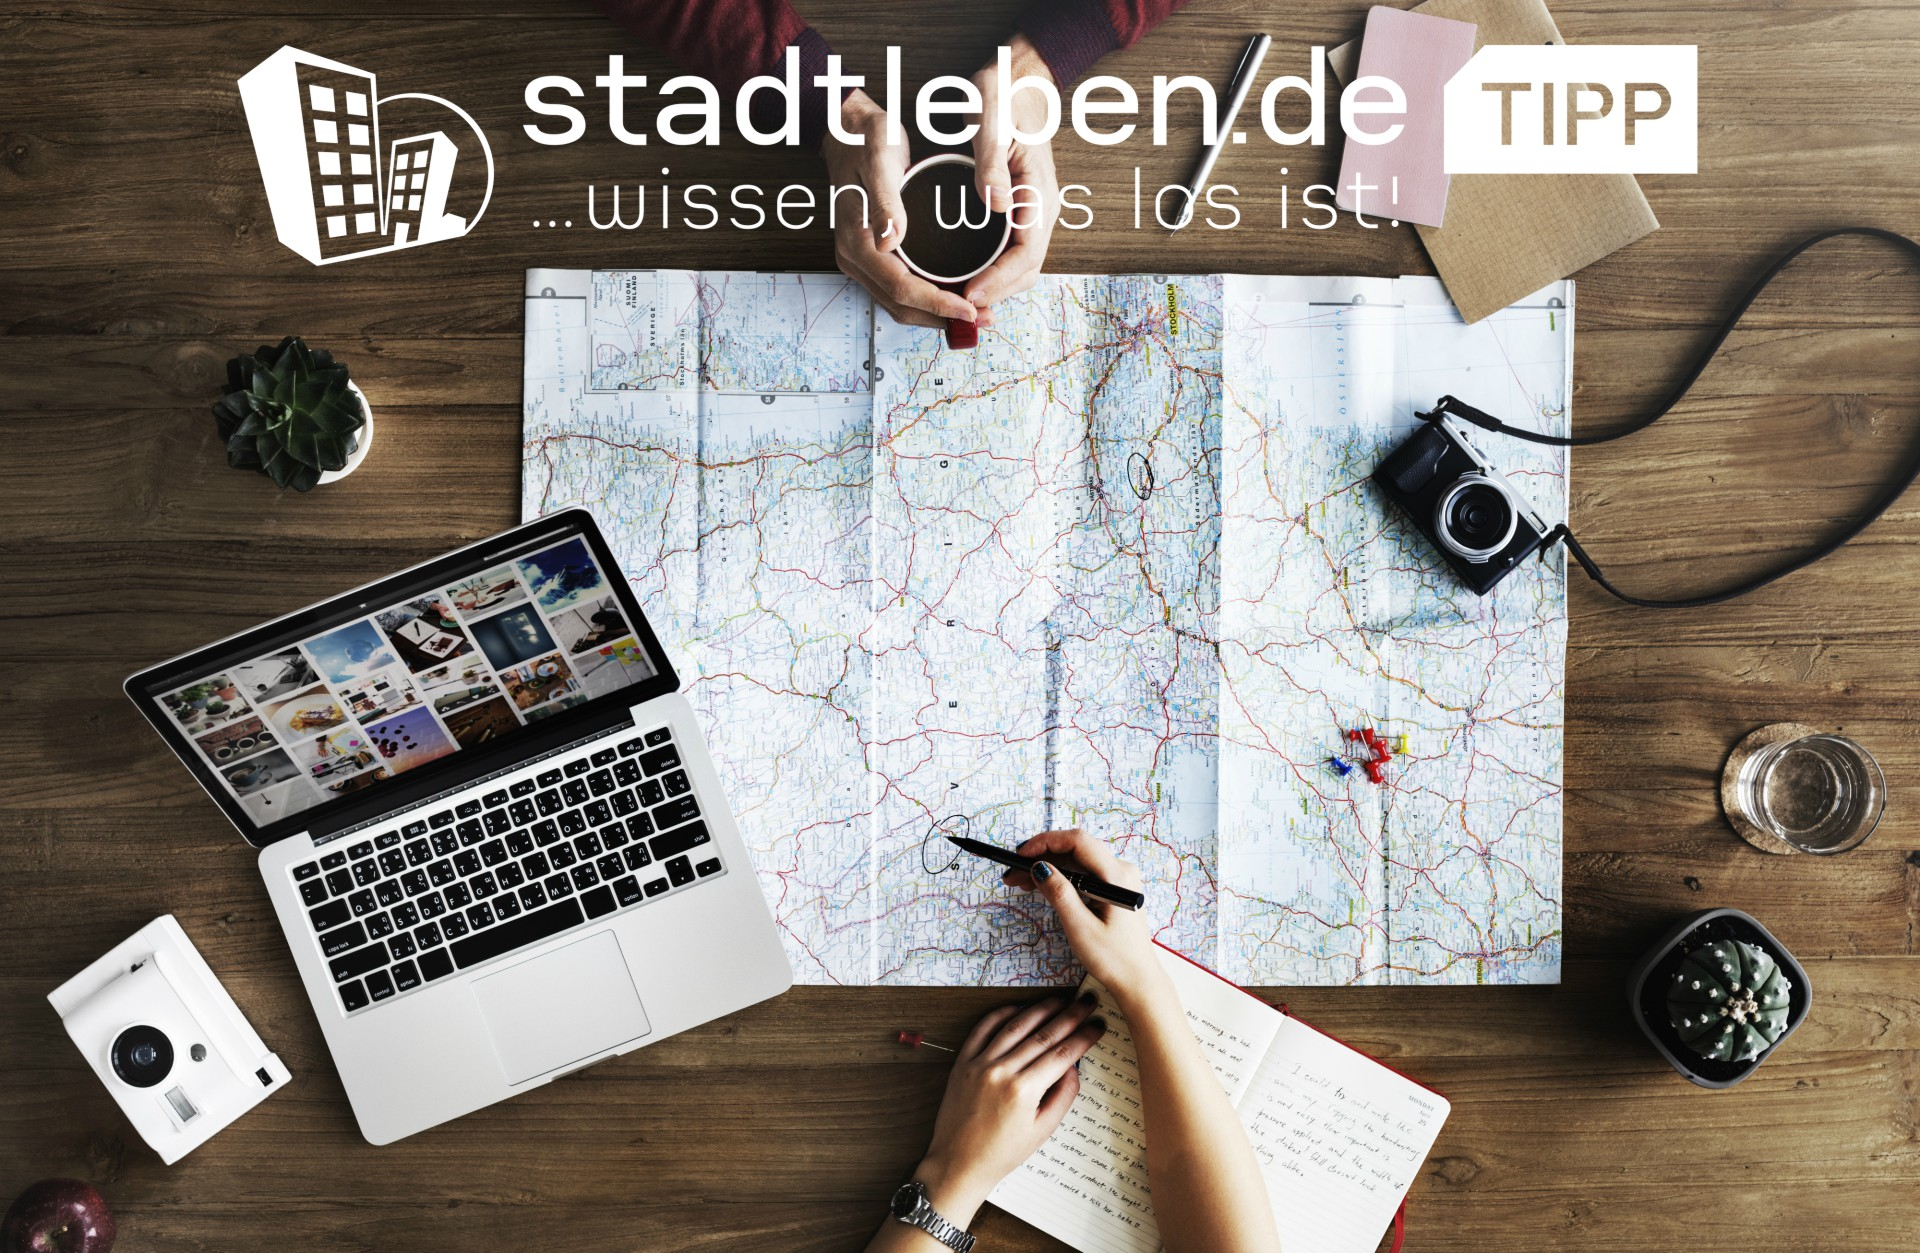 Landkarte, Laptop, Fotoapperat, Notizbuch